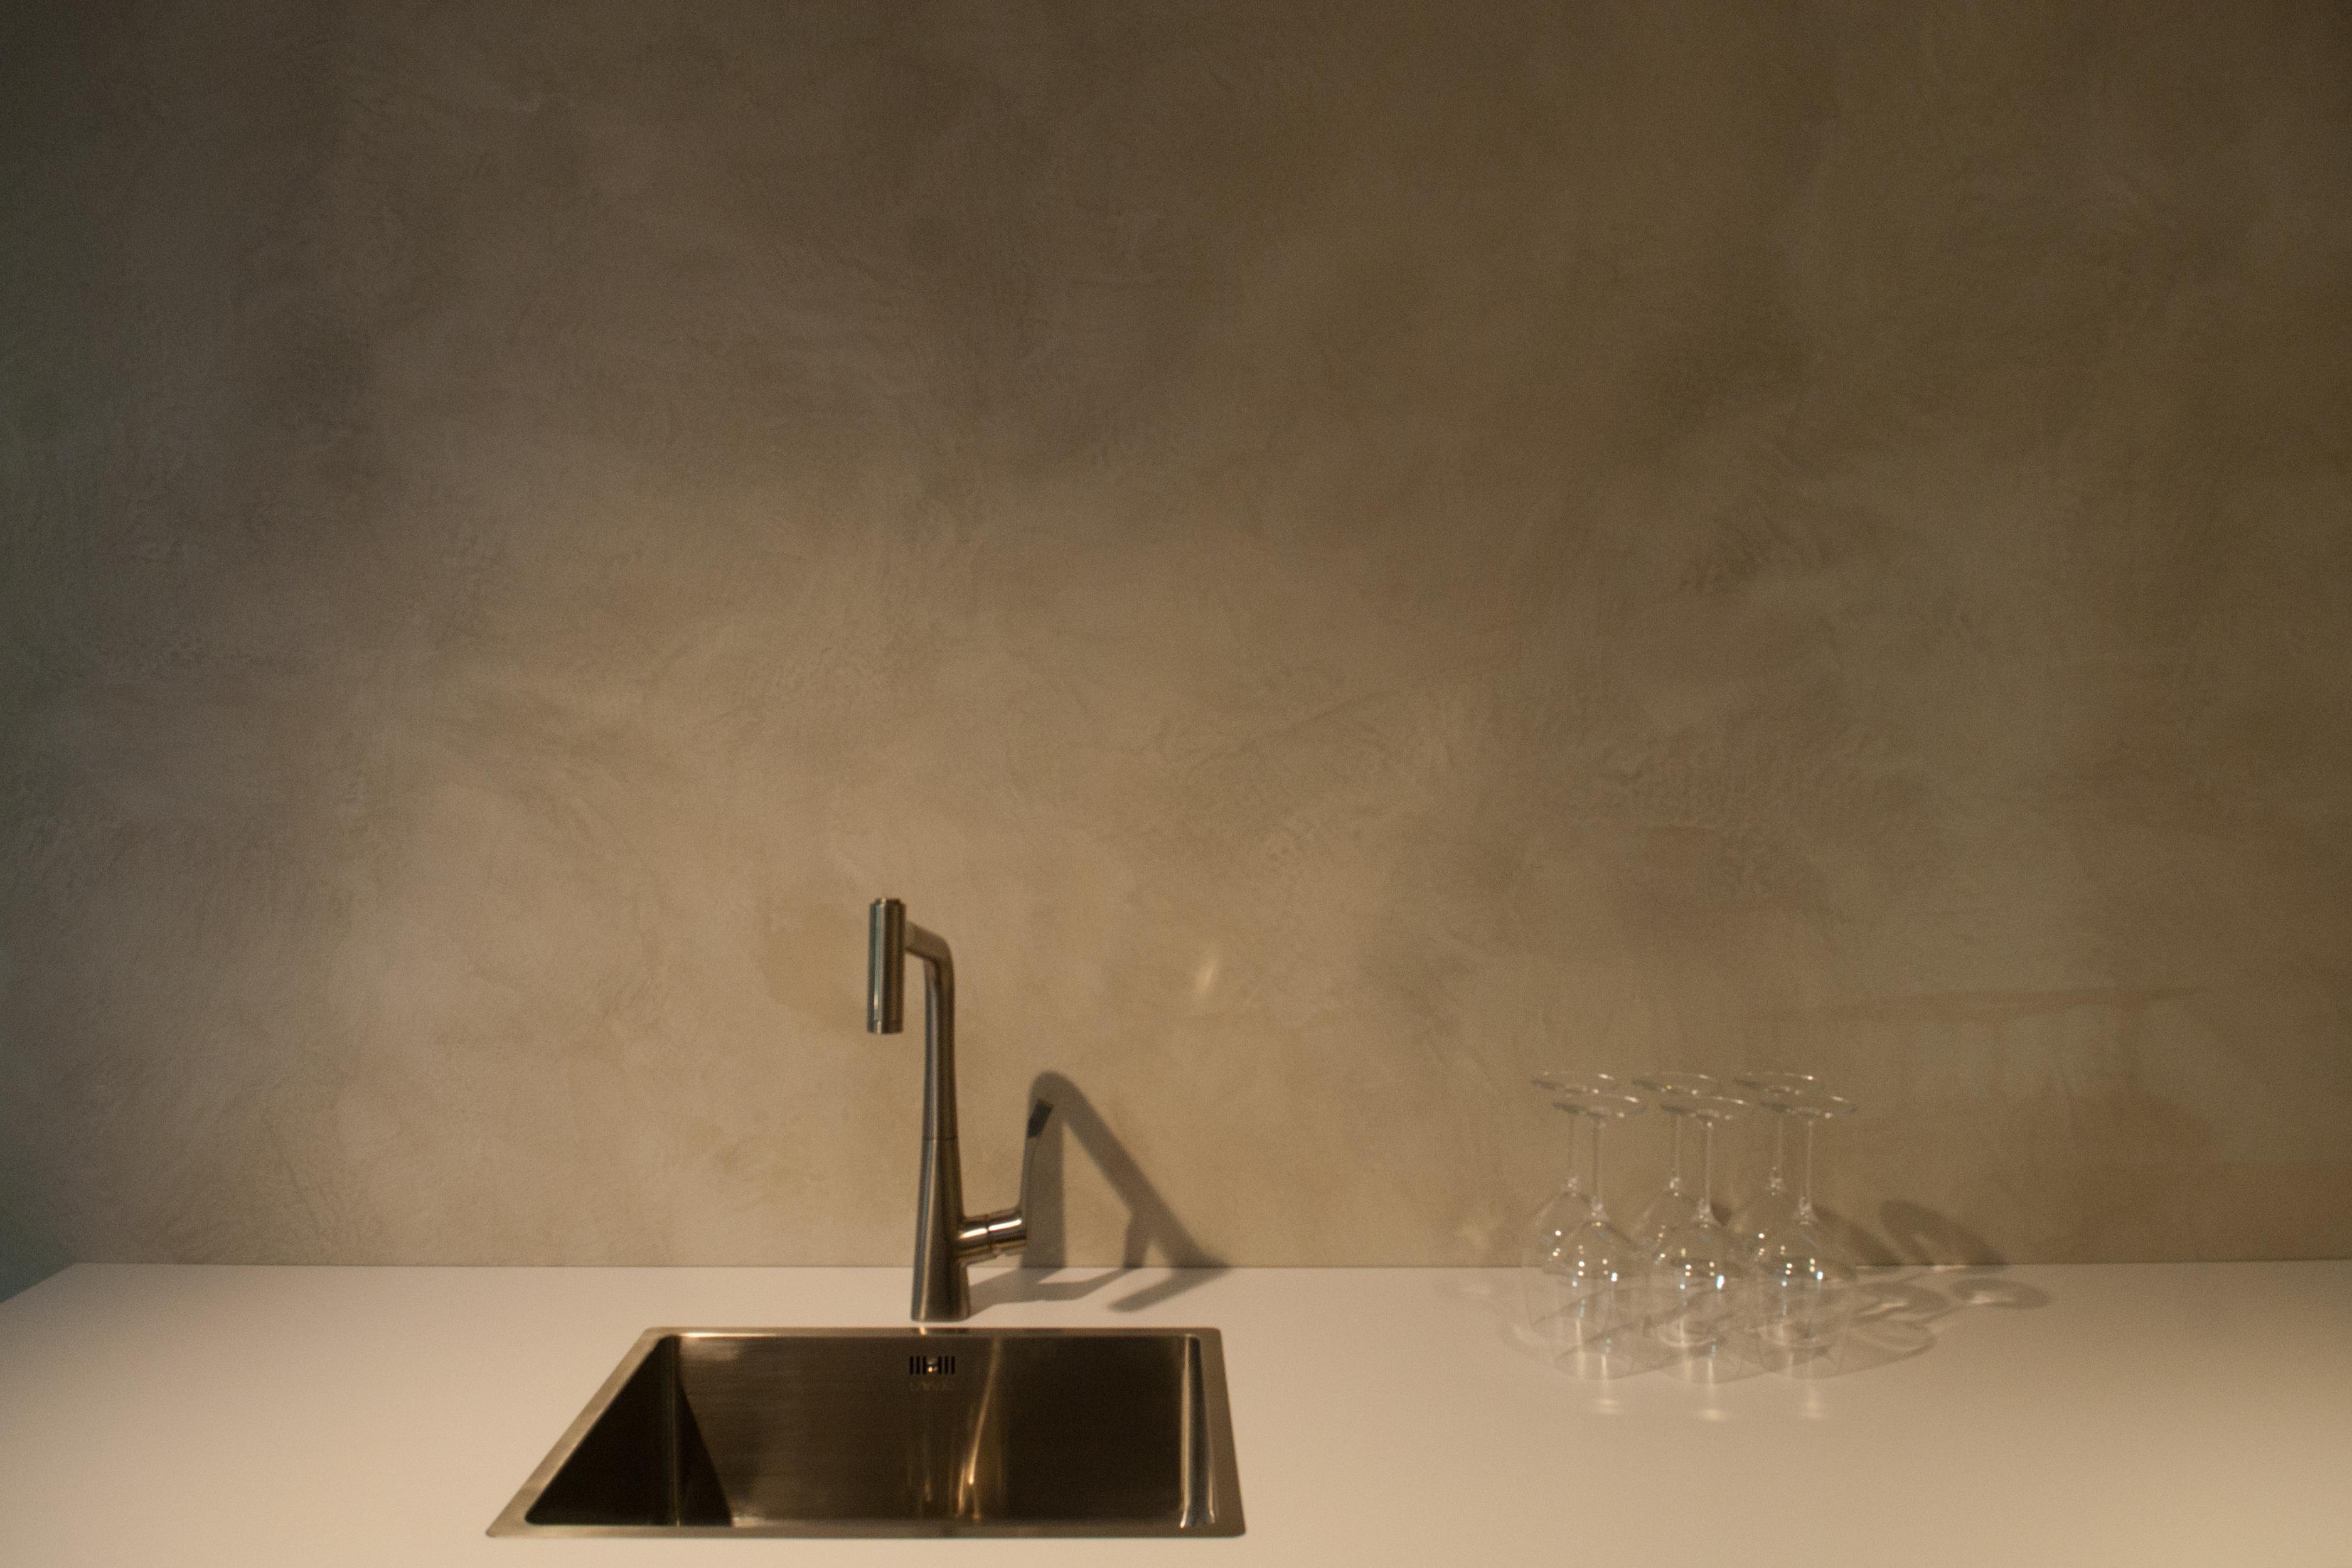 Plieger Badkamer Galerij : Mooi betonstuc badkamer badkamermeubels ontwerpen 2017